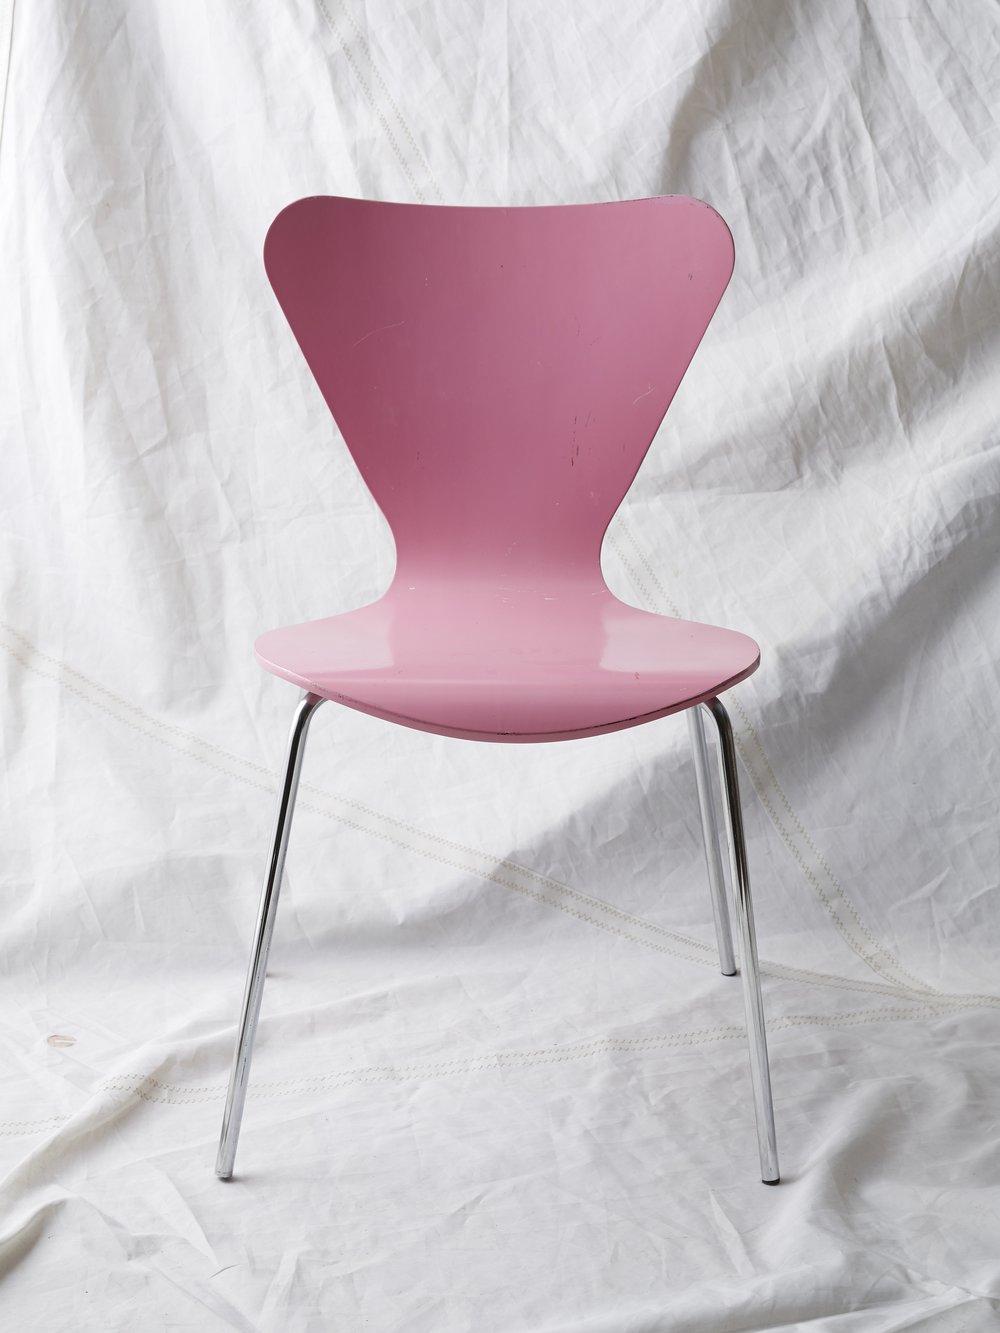 "CH019 Arne Jacobson pink chair 32"" H x 18"" W x 19"" D $75/week"